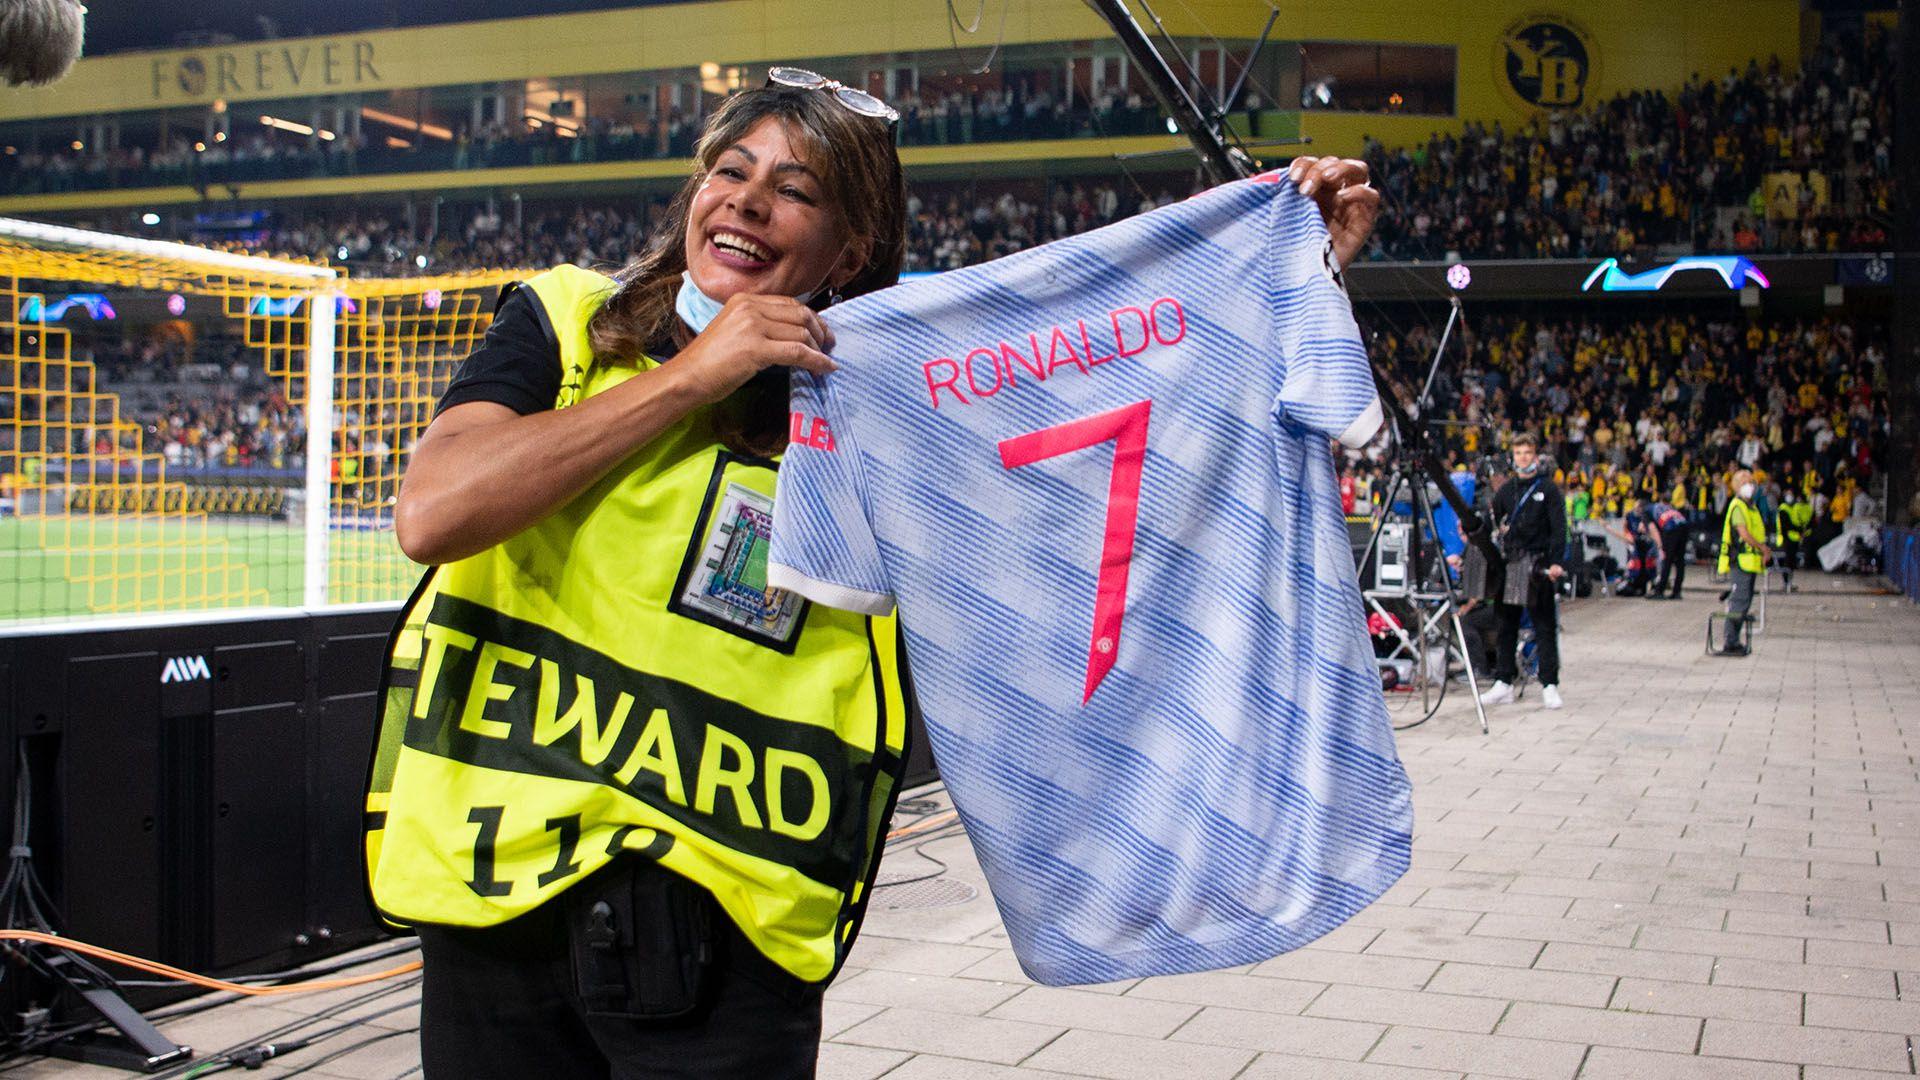 camiseta cristiano ronaldo mujer seguridad